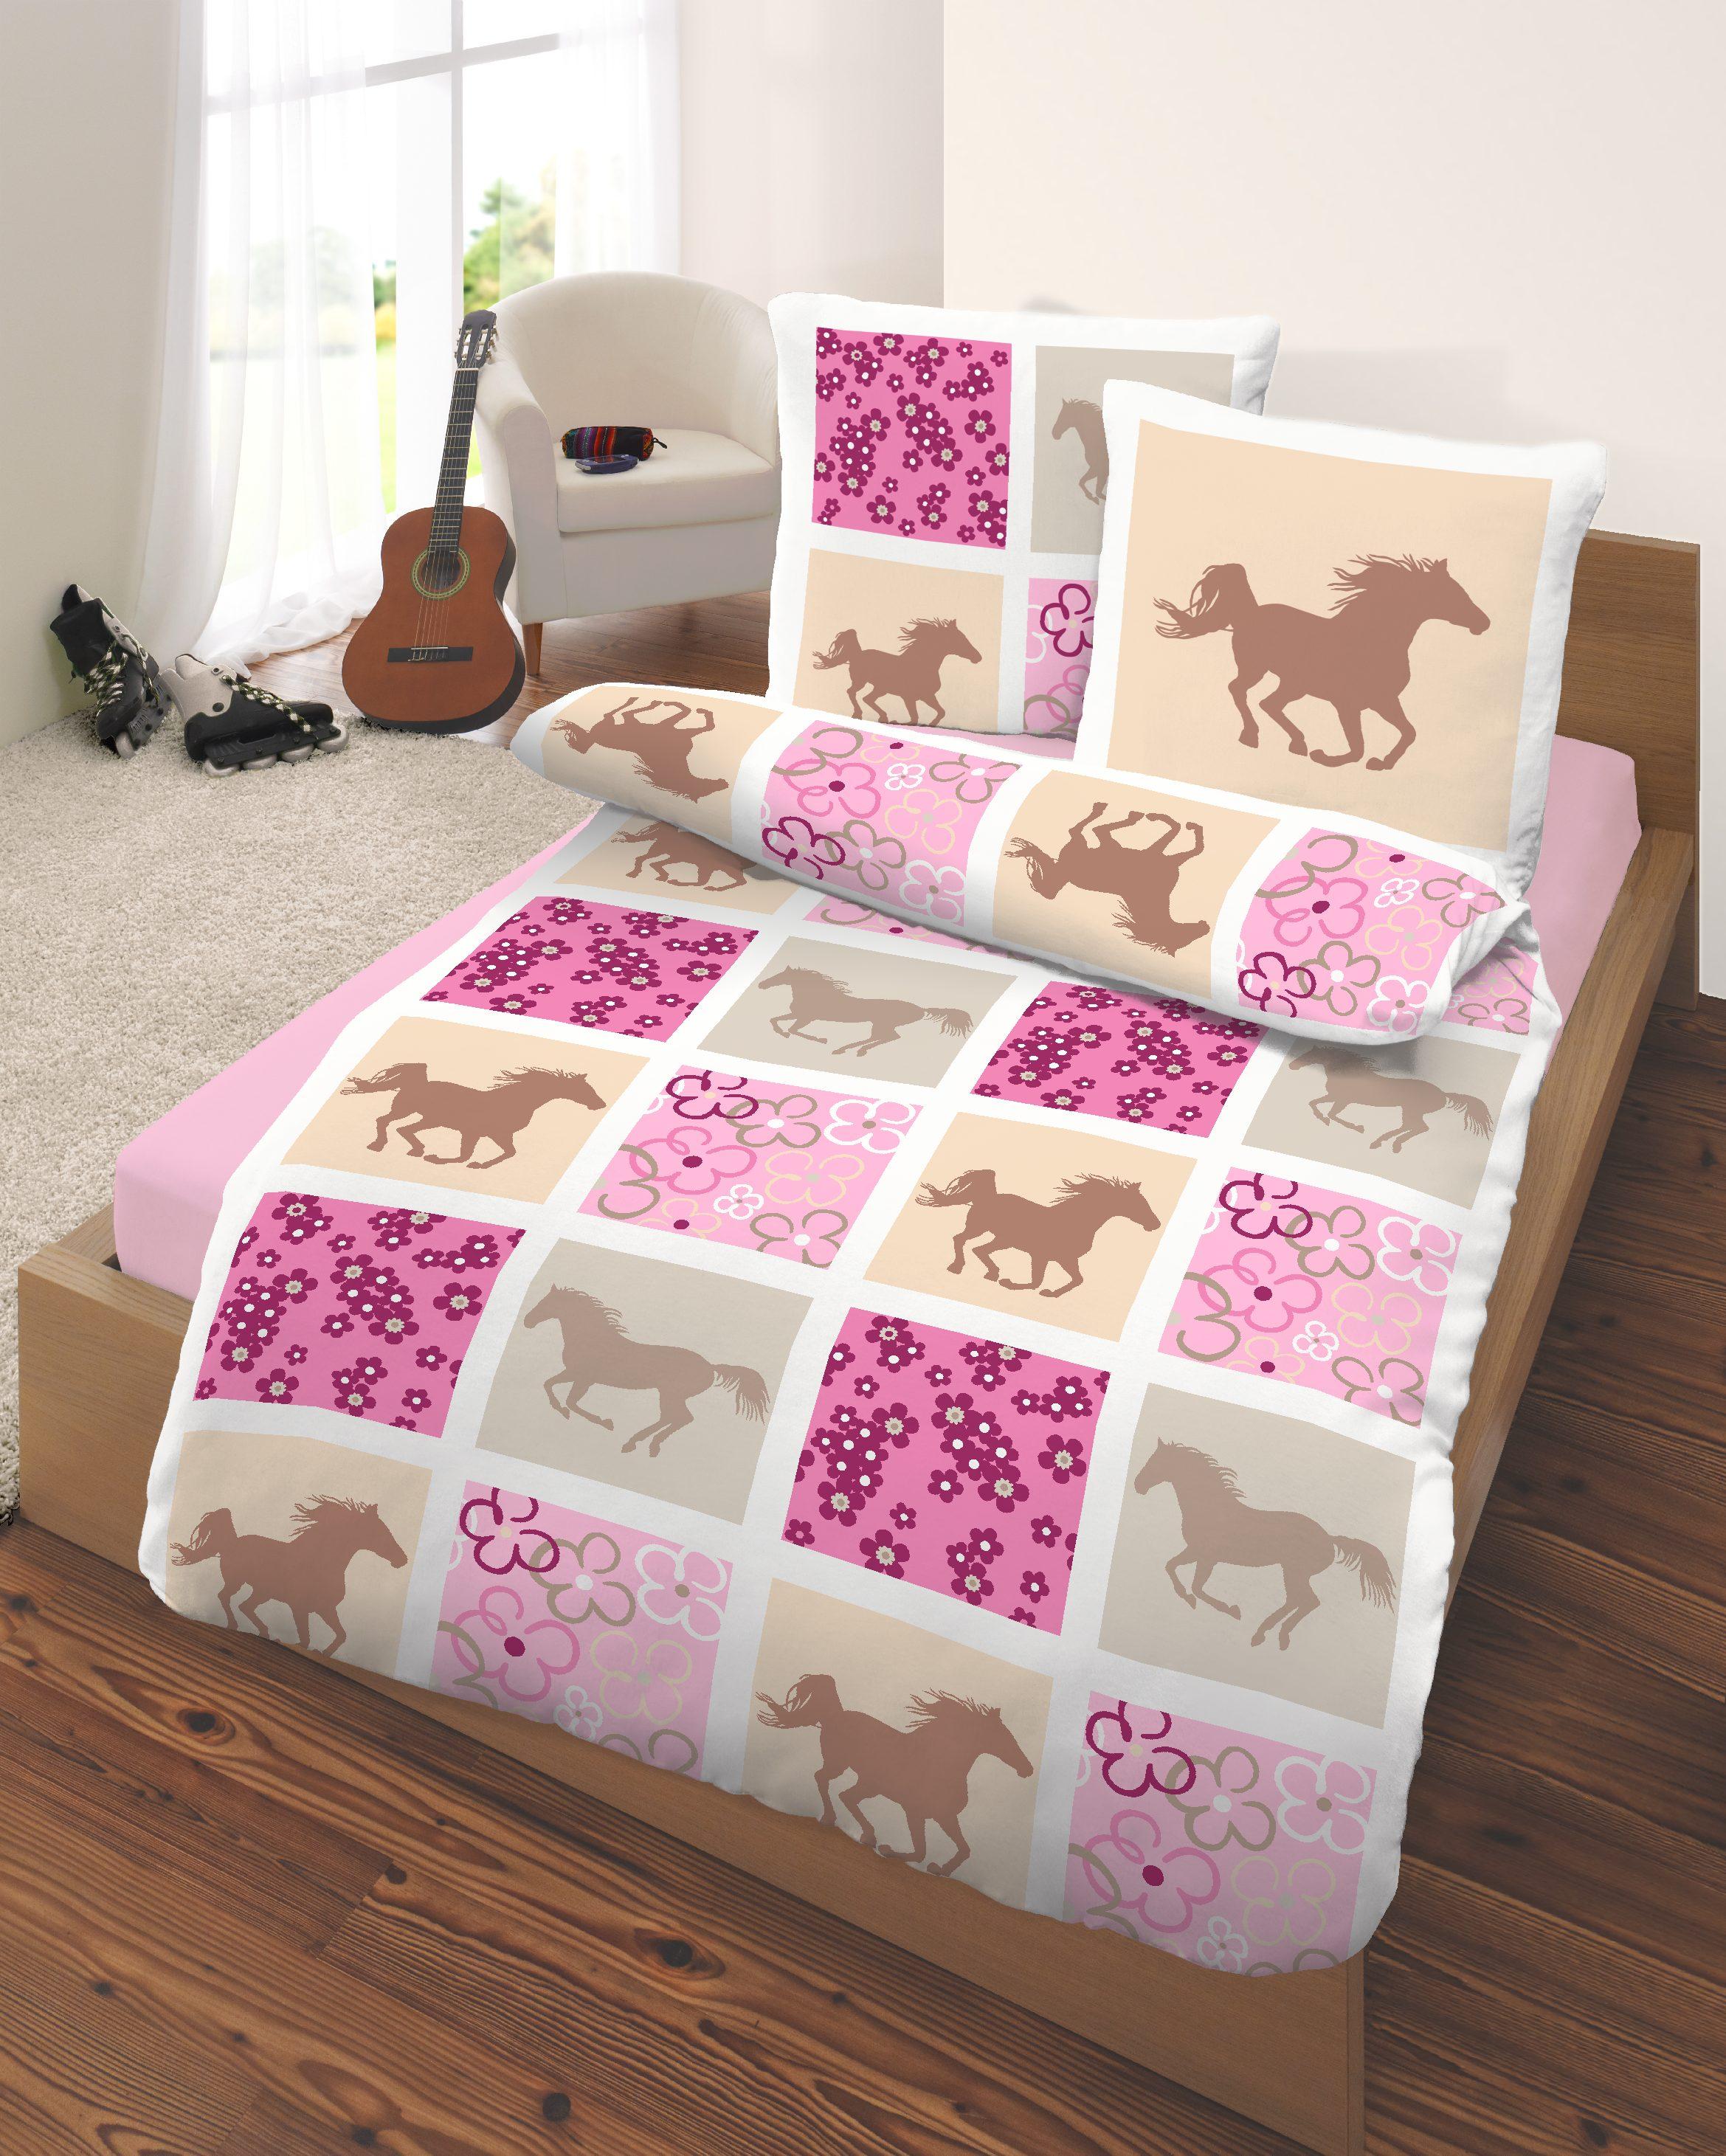 baby kinder u jugend kollektion bettw sche schlafen ido shop. Black Bedroom Furniture Sets. Home Design Ideas